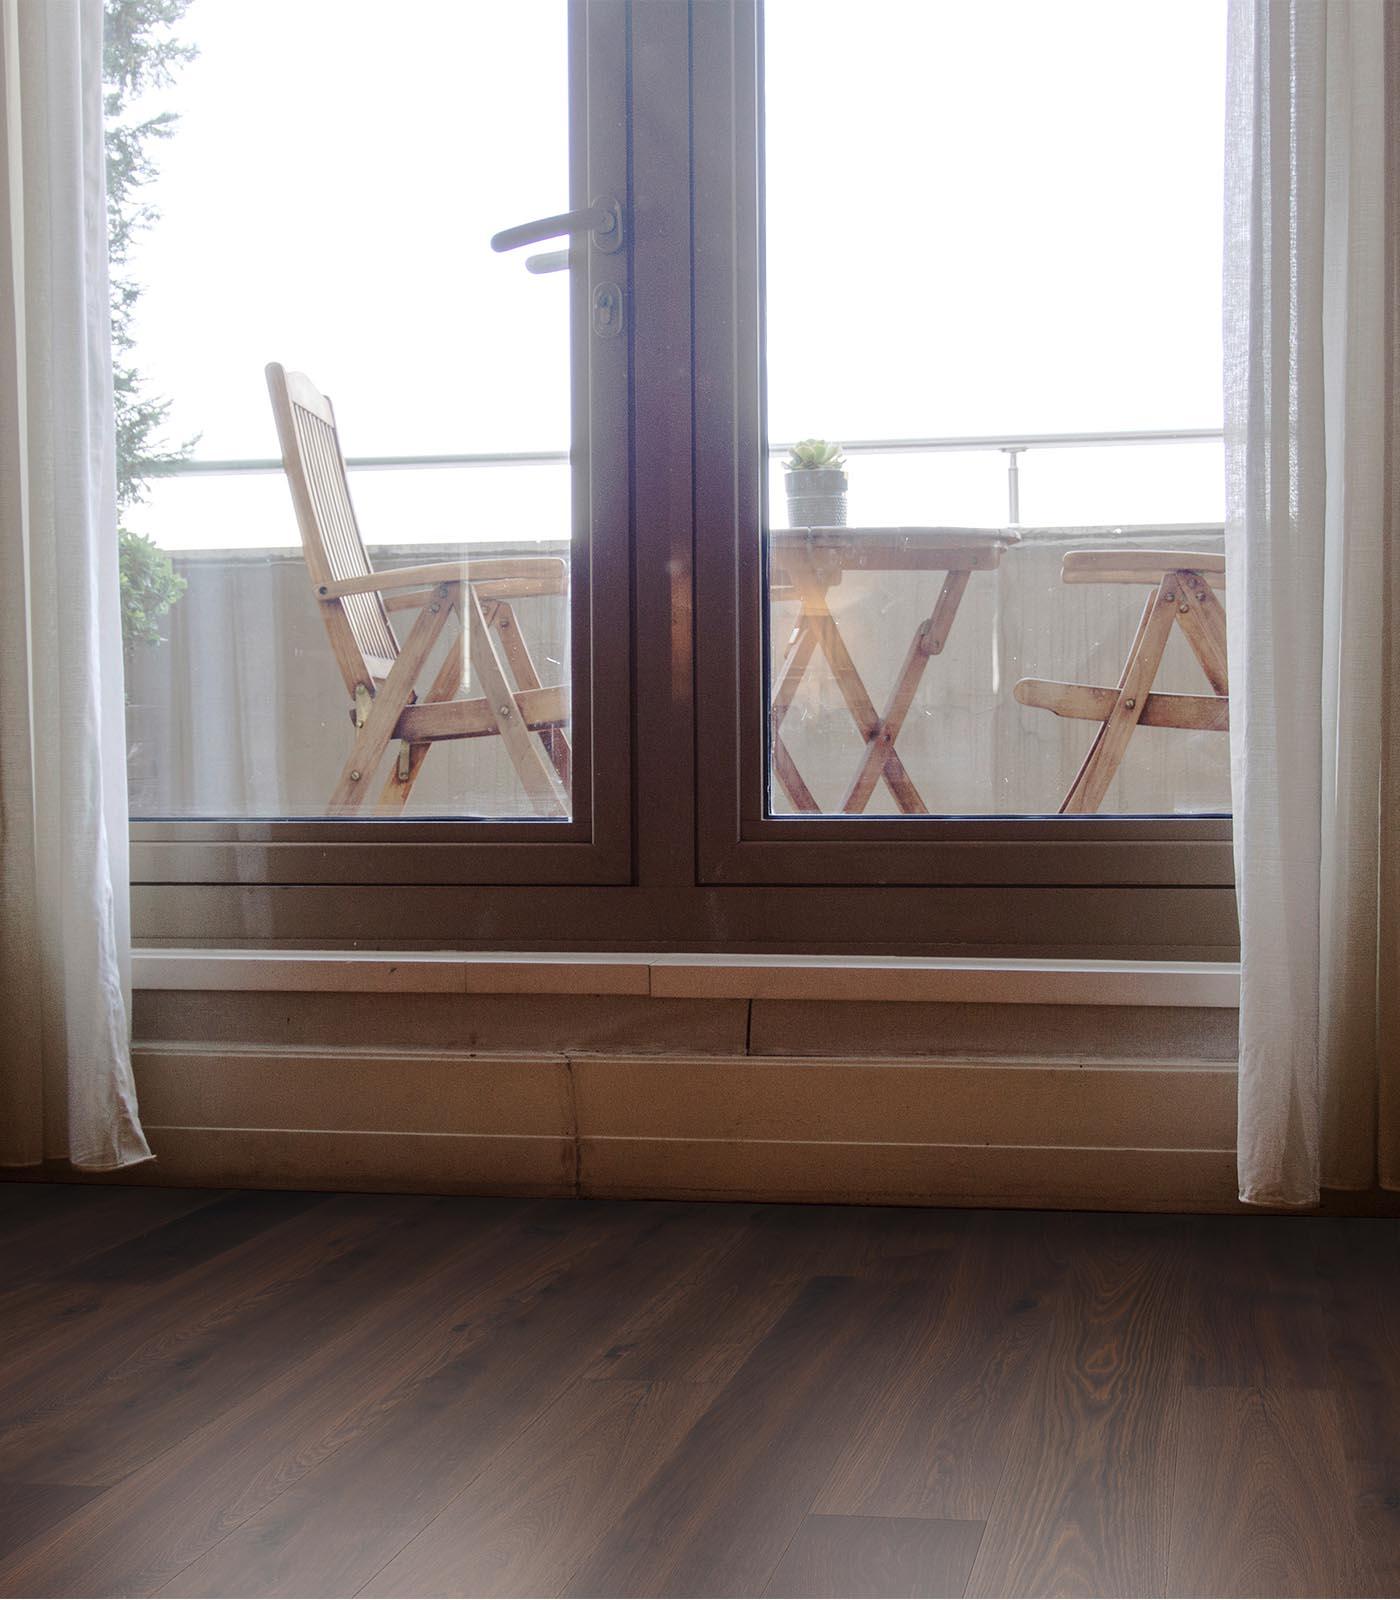 Smoked-European-Oak-floors-Origins-Collection-room